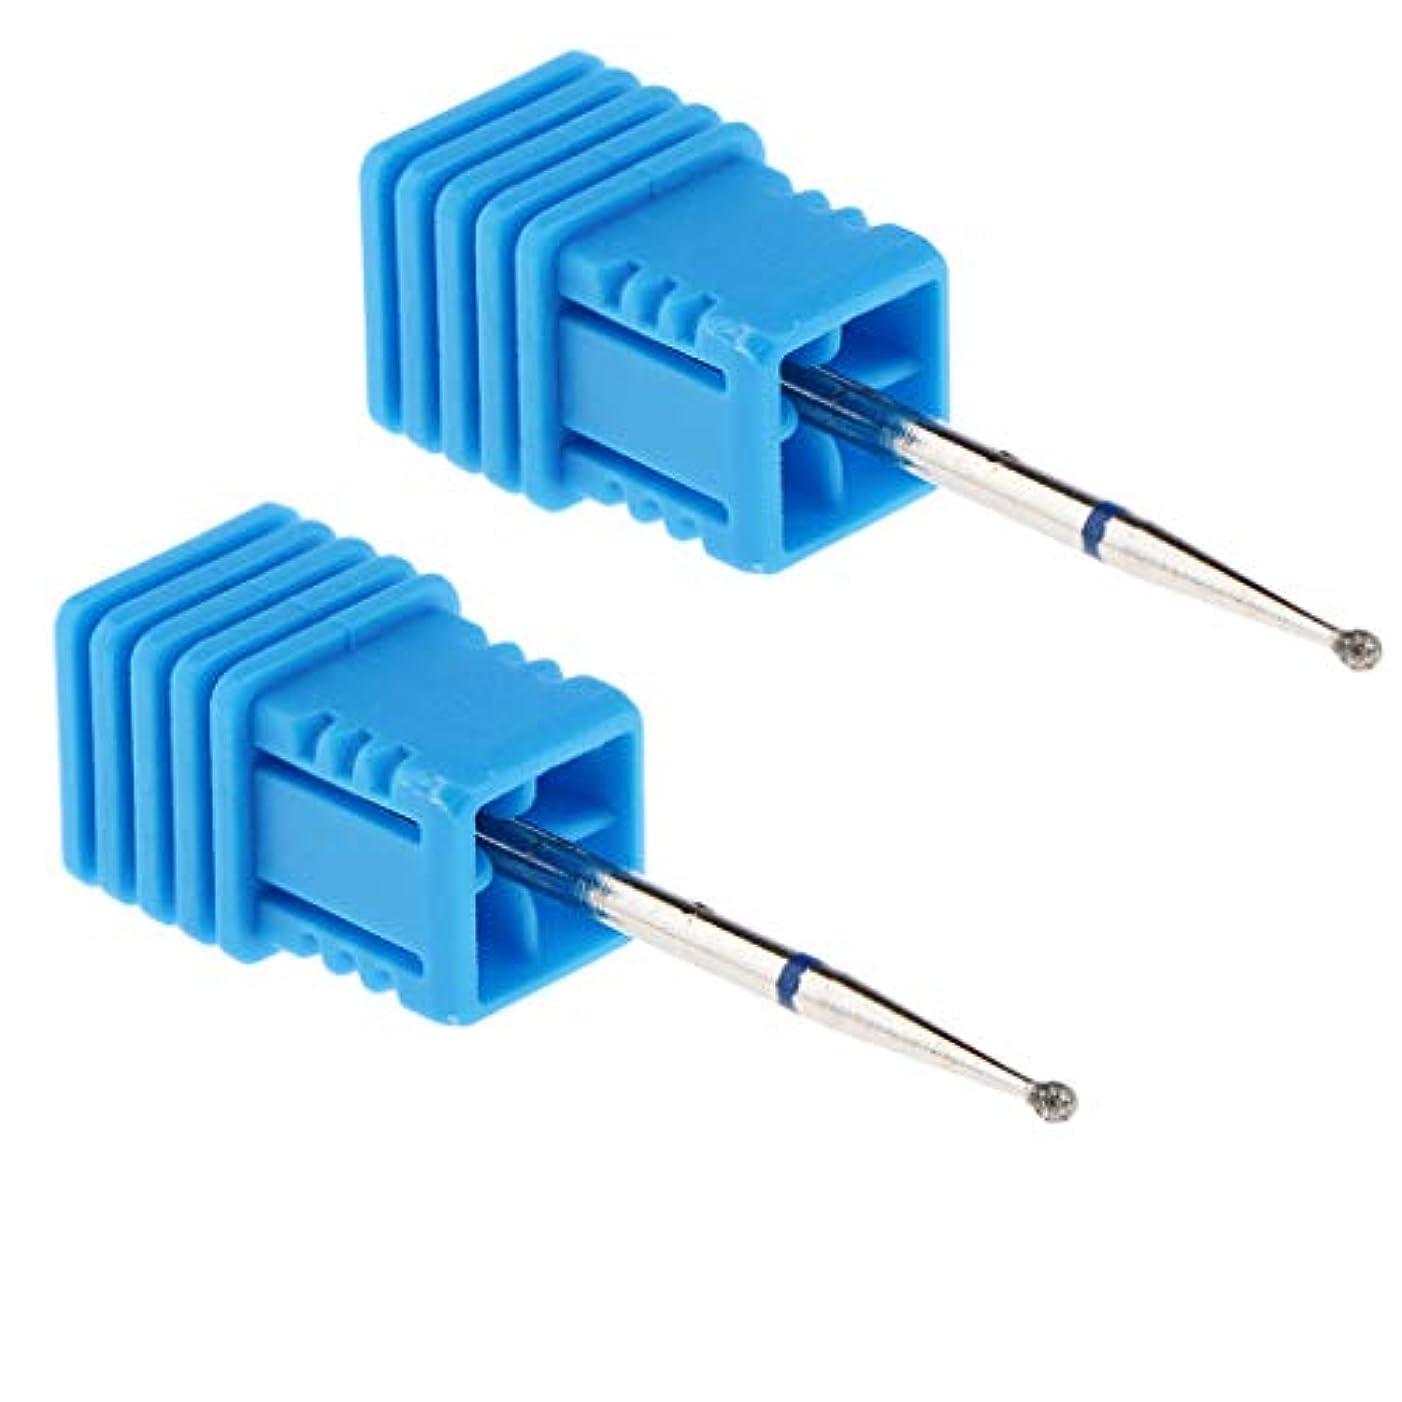 Perfeclan 陶磁器ドリルビット ネイルマシンビット 研削ネイル ネイルドリルビット ネイルマシーン用ビット 2個入